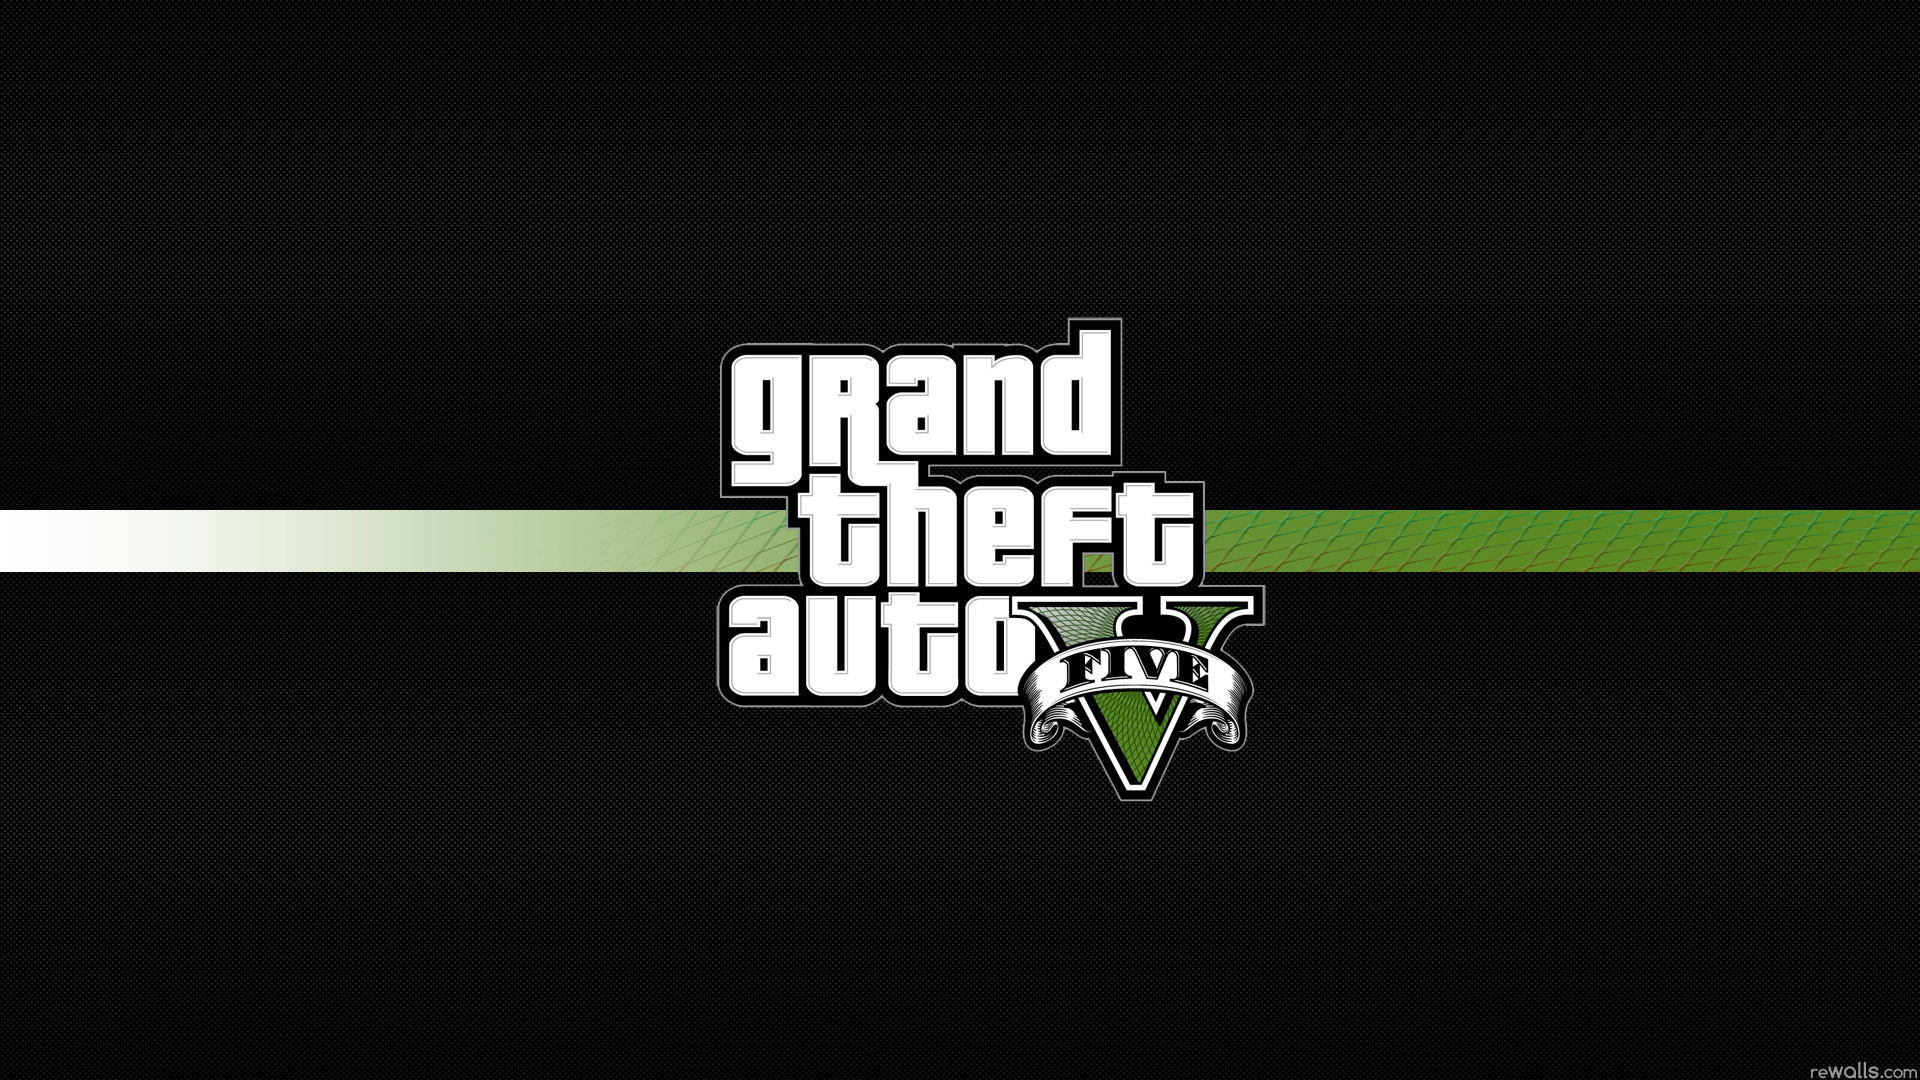 Wallpaper Gta 5 Grand Theft Auto V Rockstar 6 Desktop Wallpapers 1920x1080